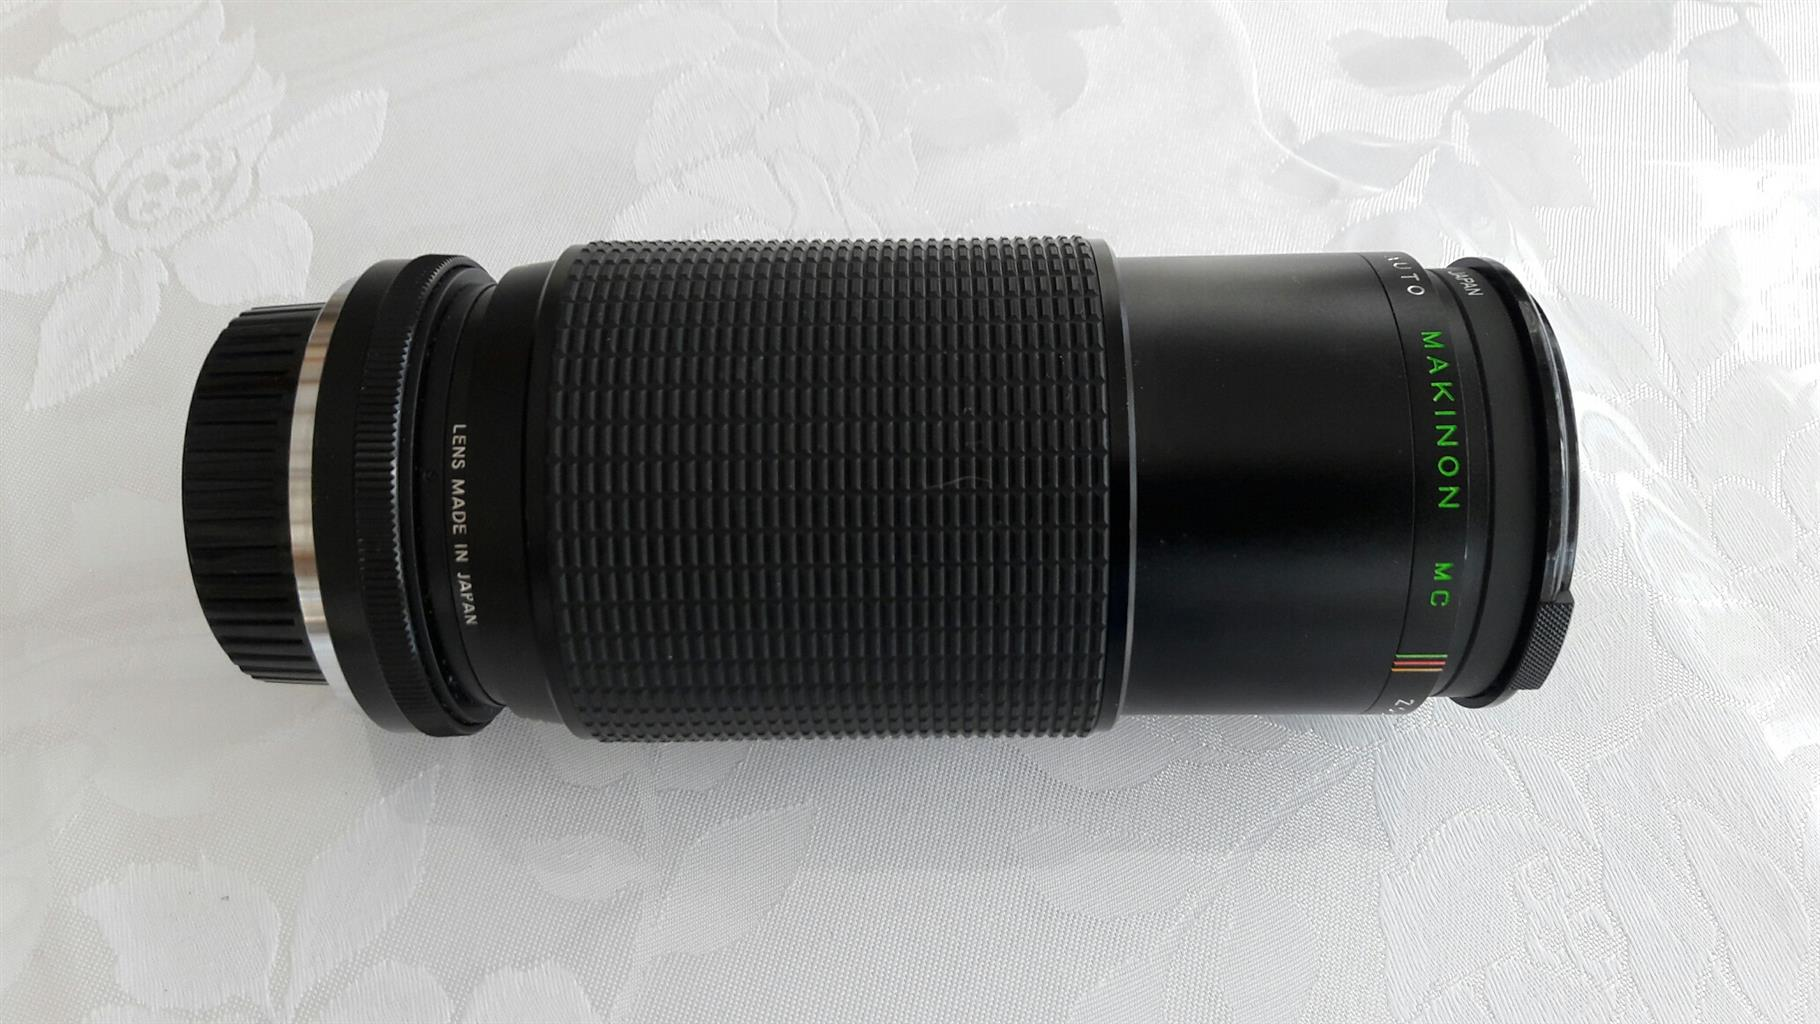 Nikomat 35mm film SLR camera.